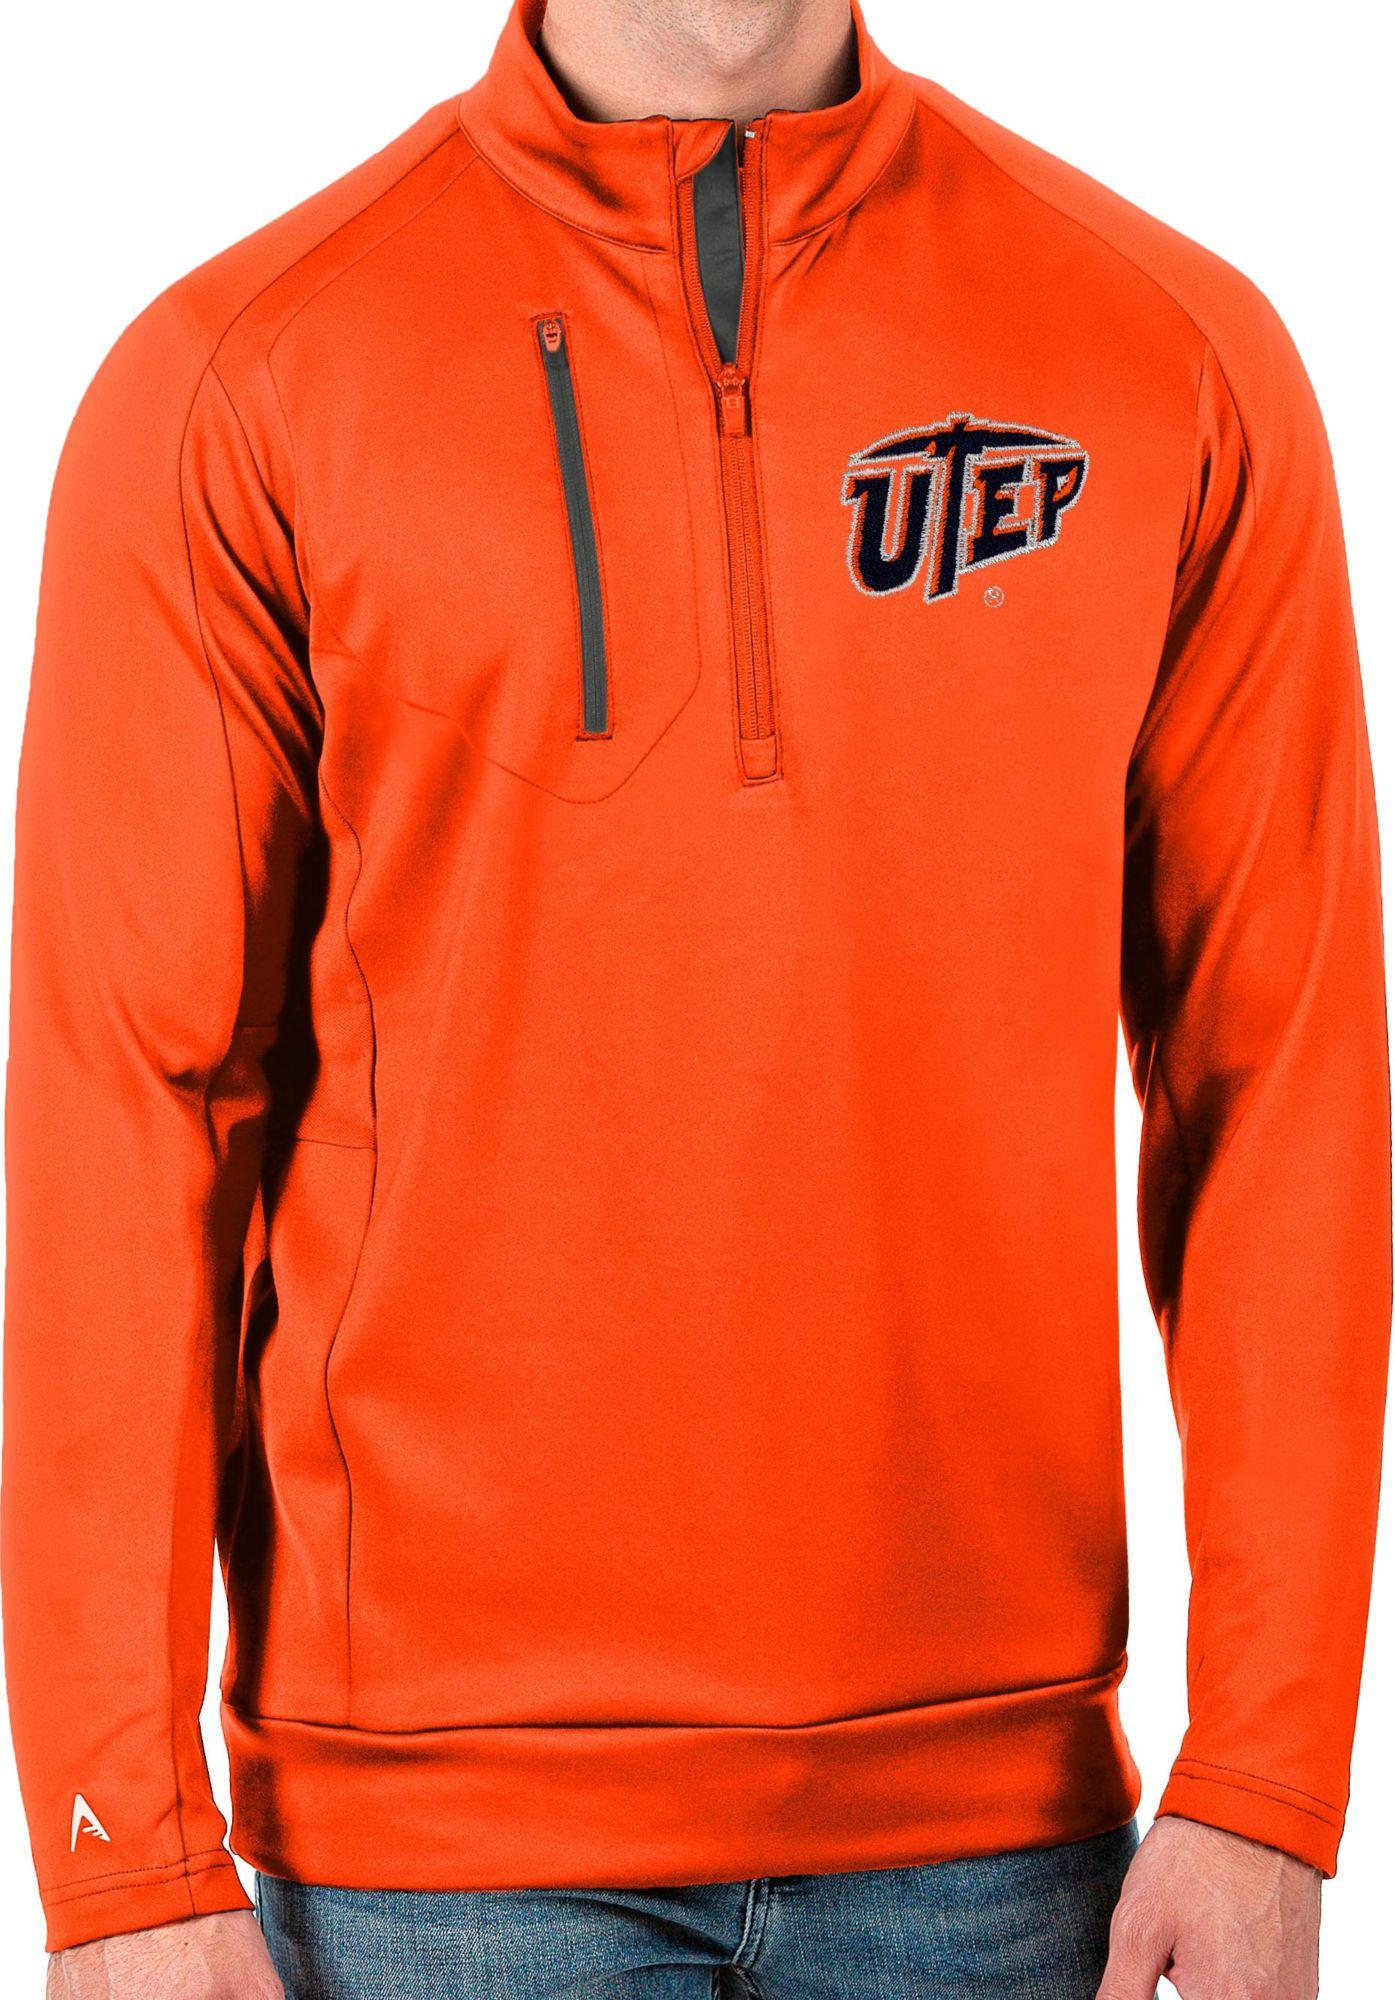 Antigua Men's UTEP Miners Blaze Orange Generation Half-Zip Pullover Shirt, Small, Blue thumbnail